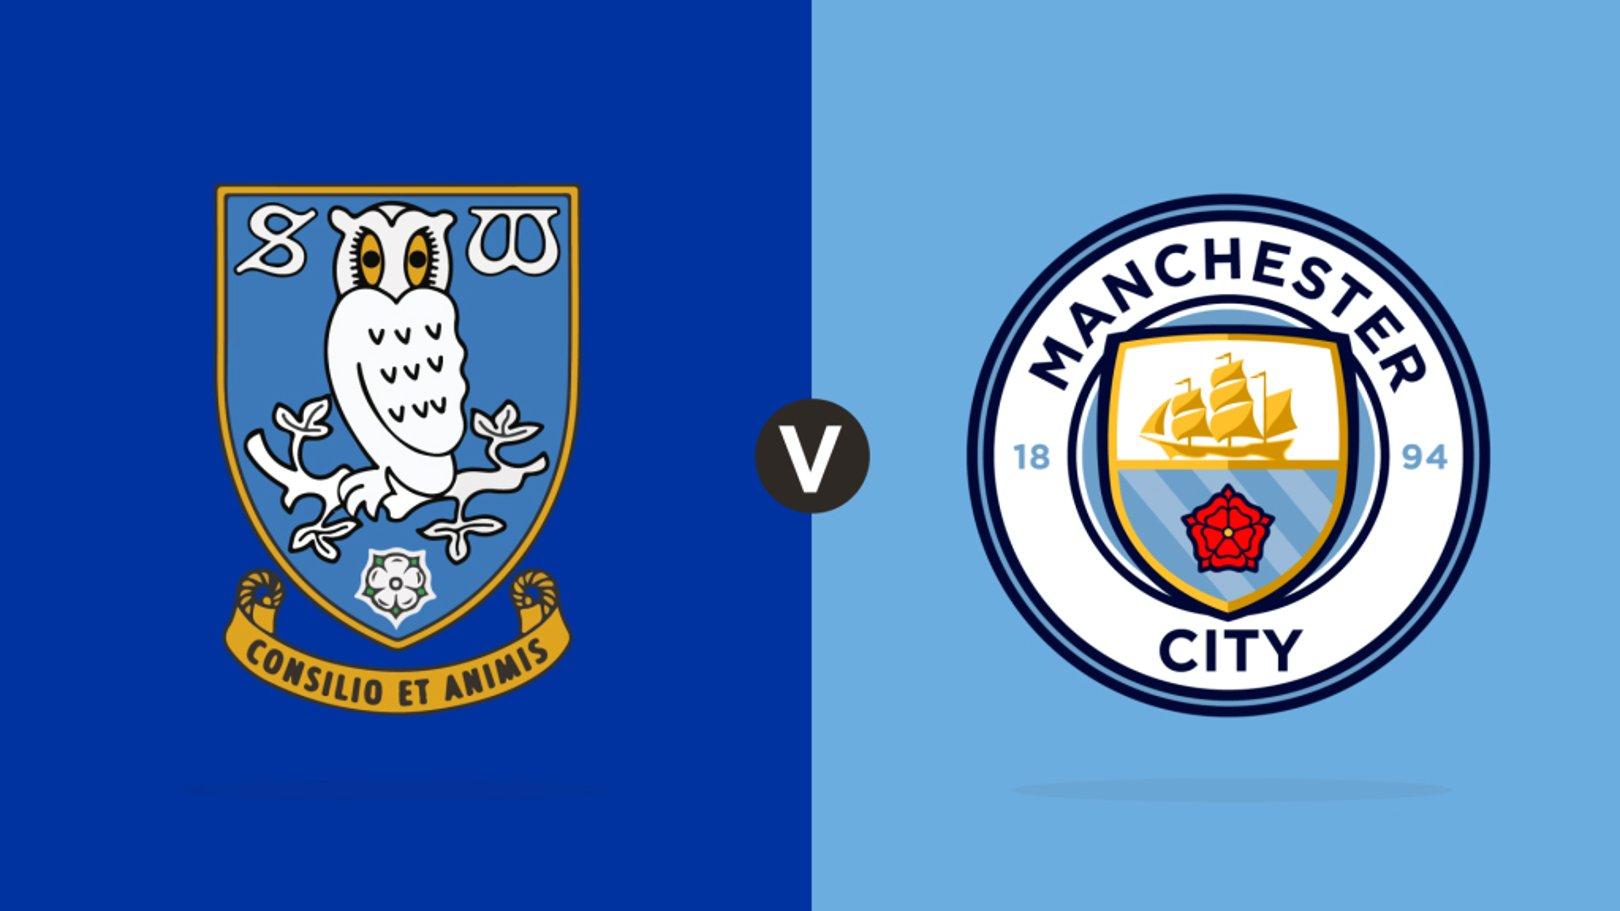 Sheffield Wednesday v Manchester City: Reaction and match stats